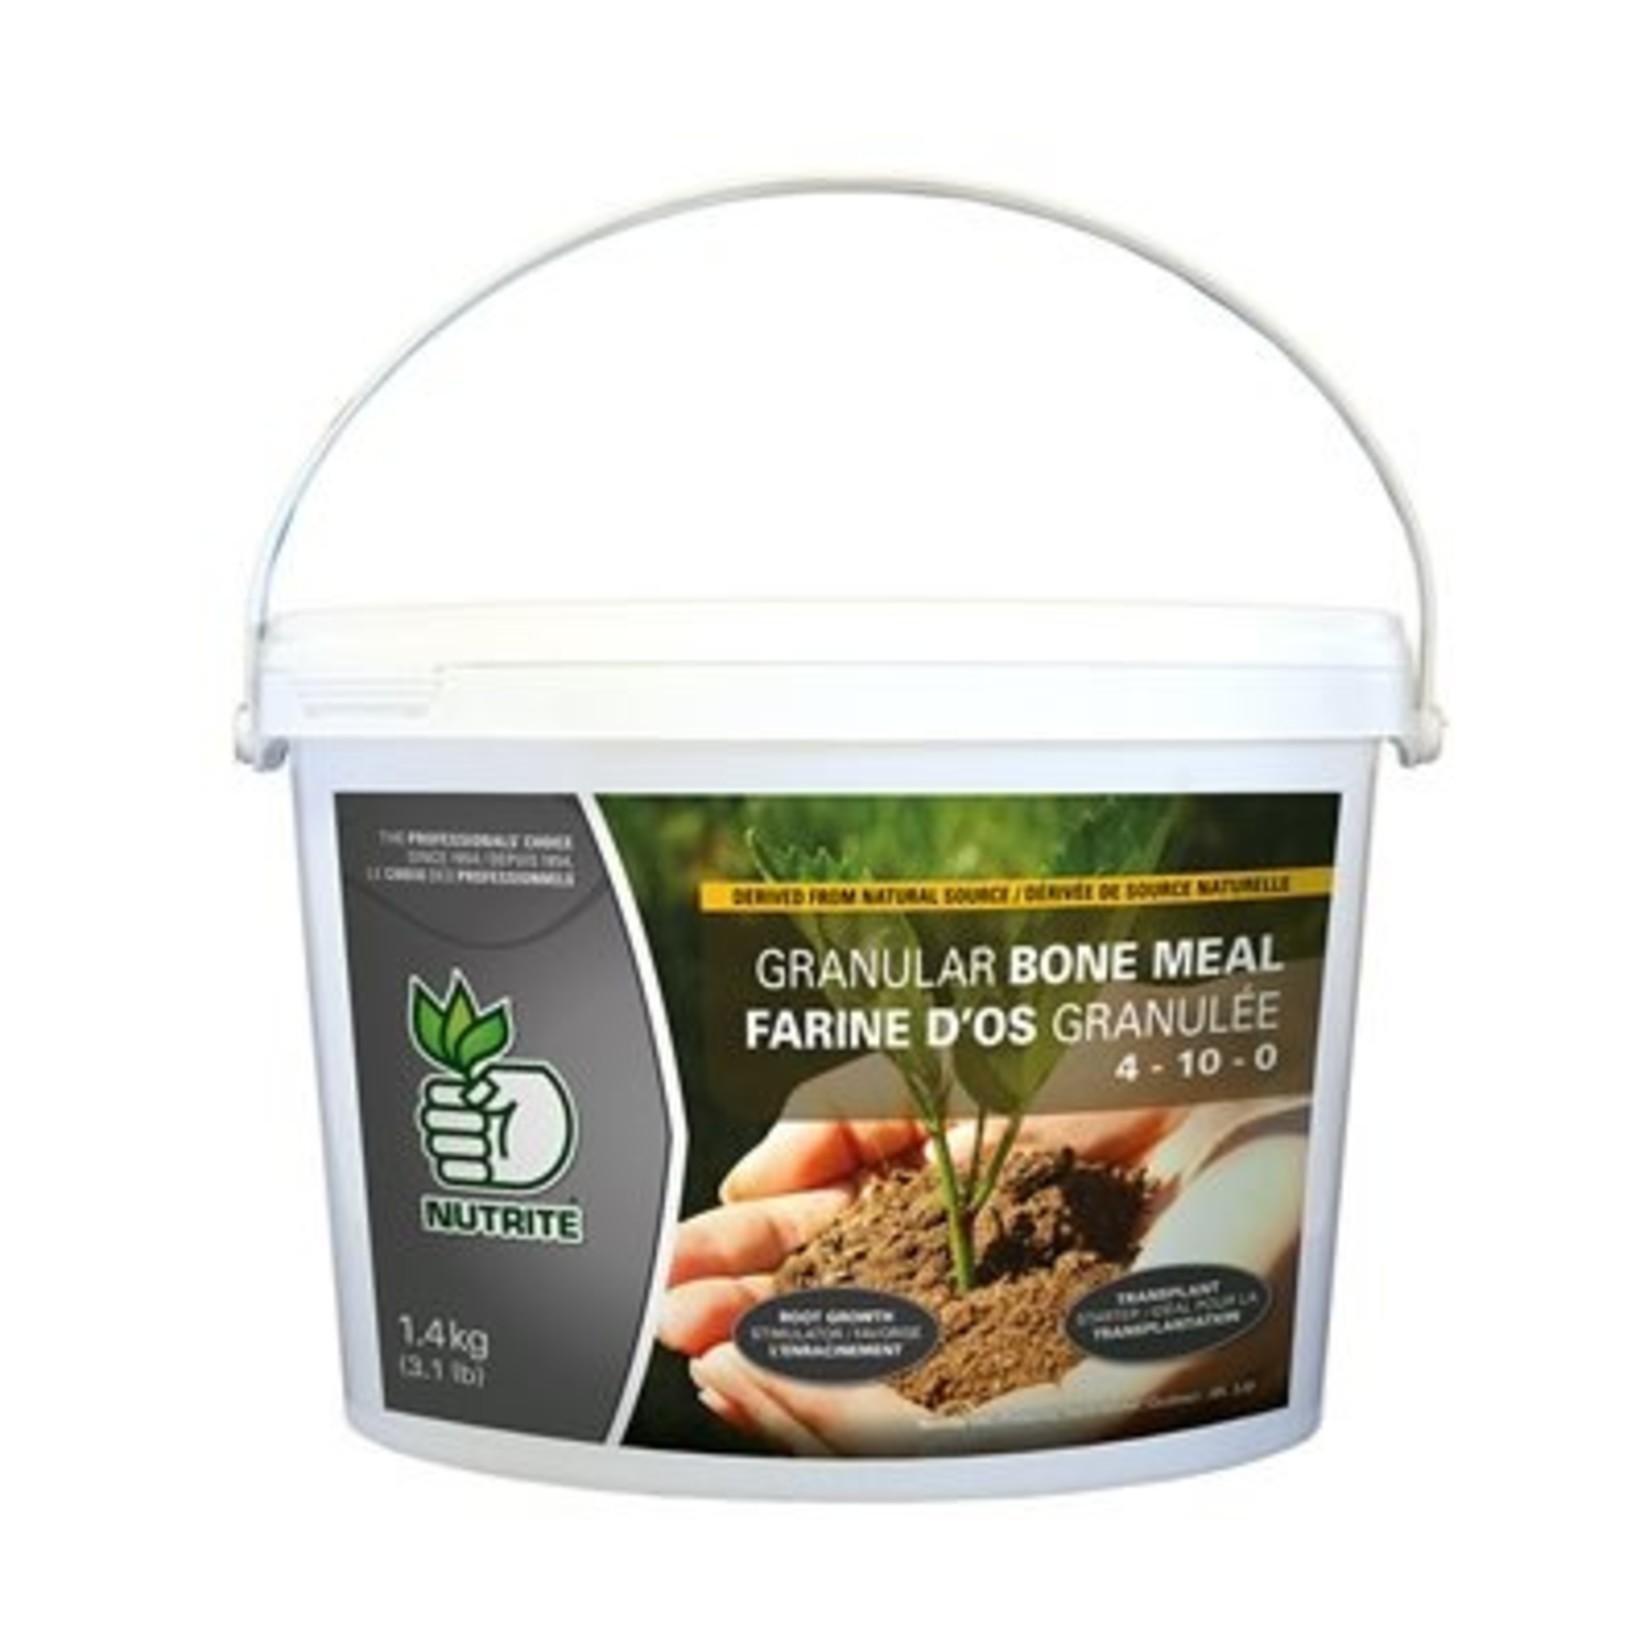 Nutrite Farine D'Os Granulée Biologique 1.4kg